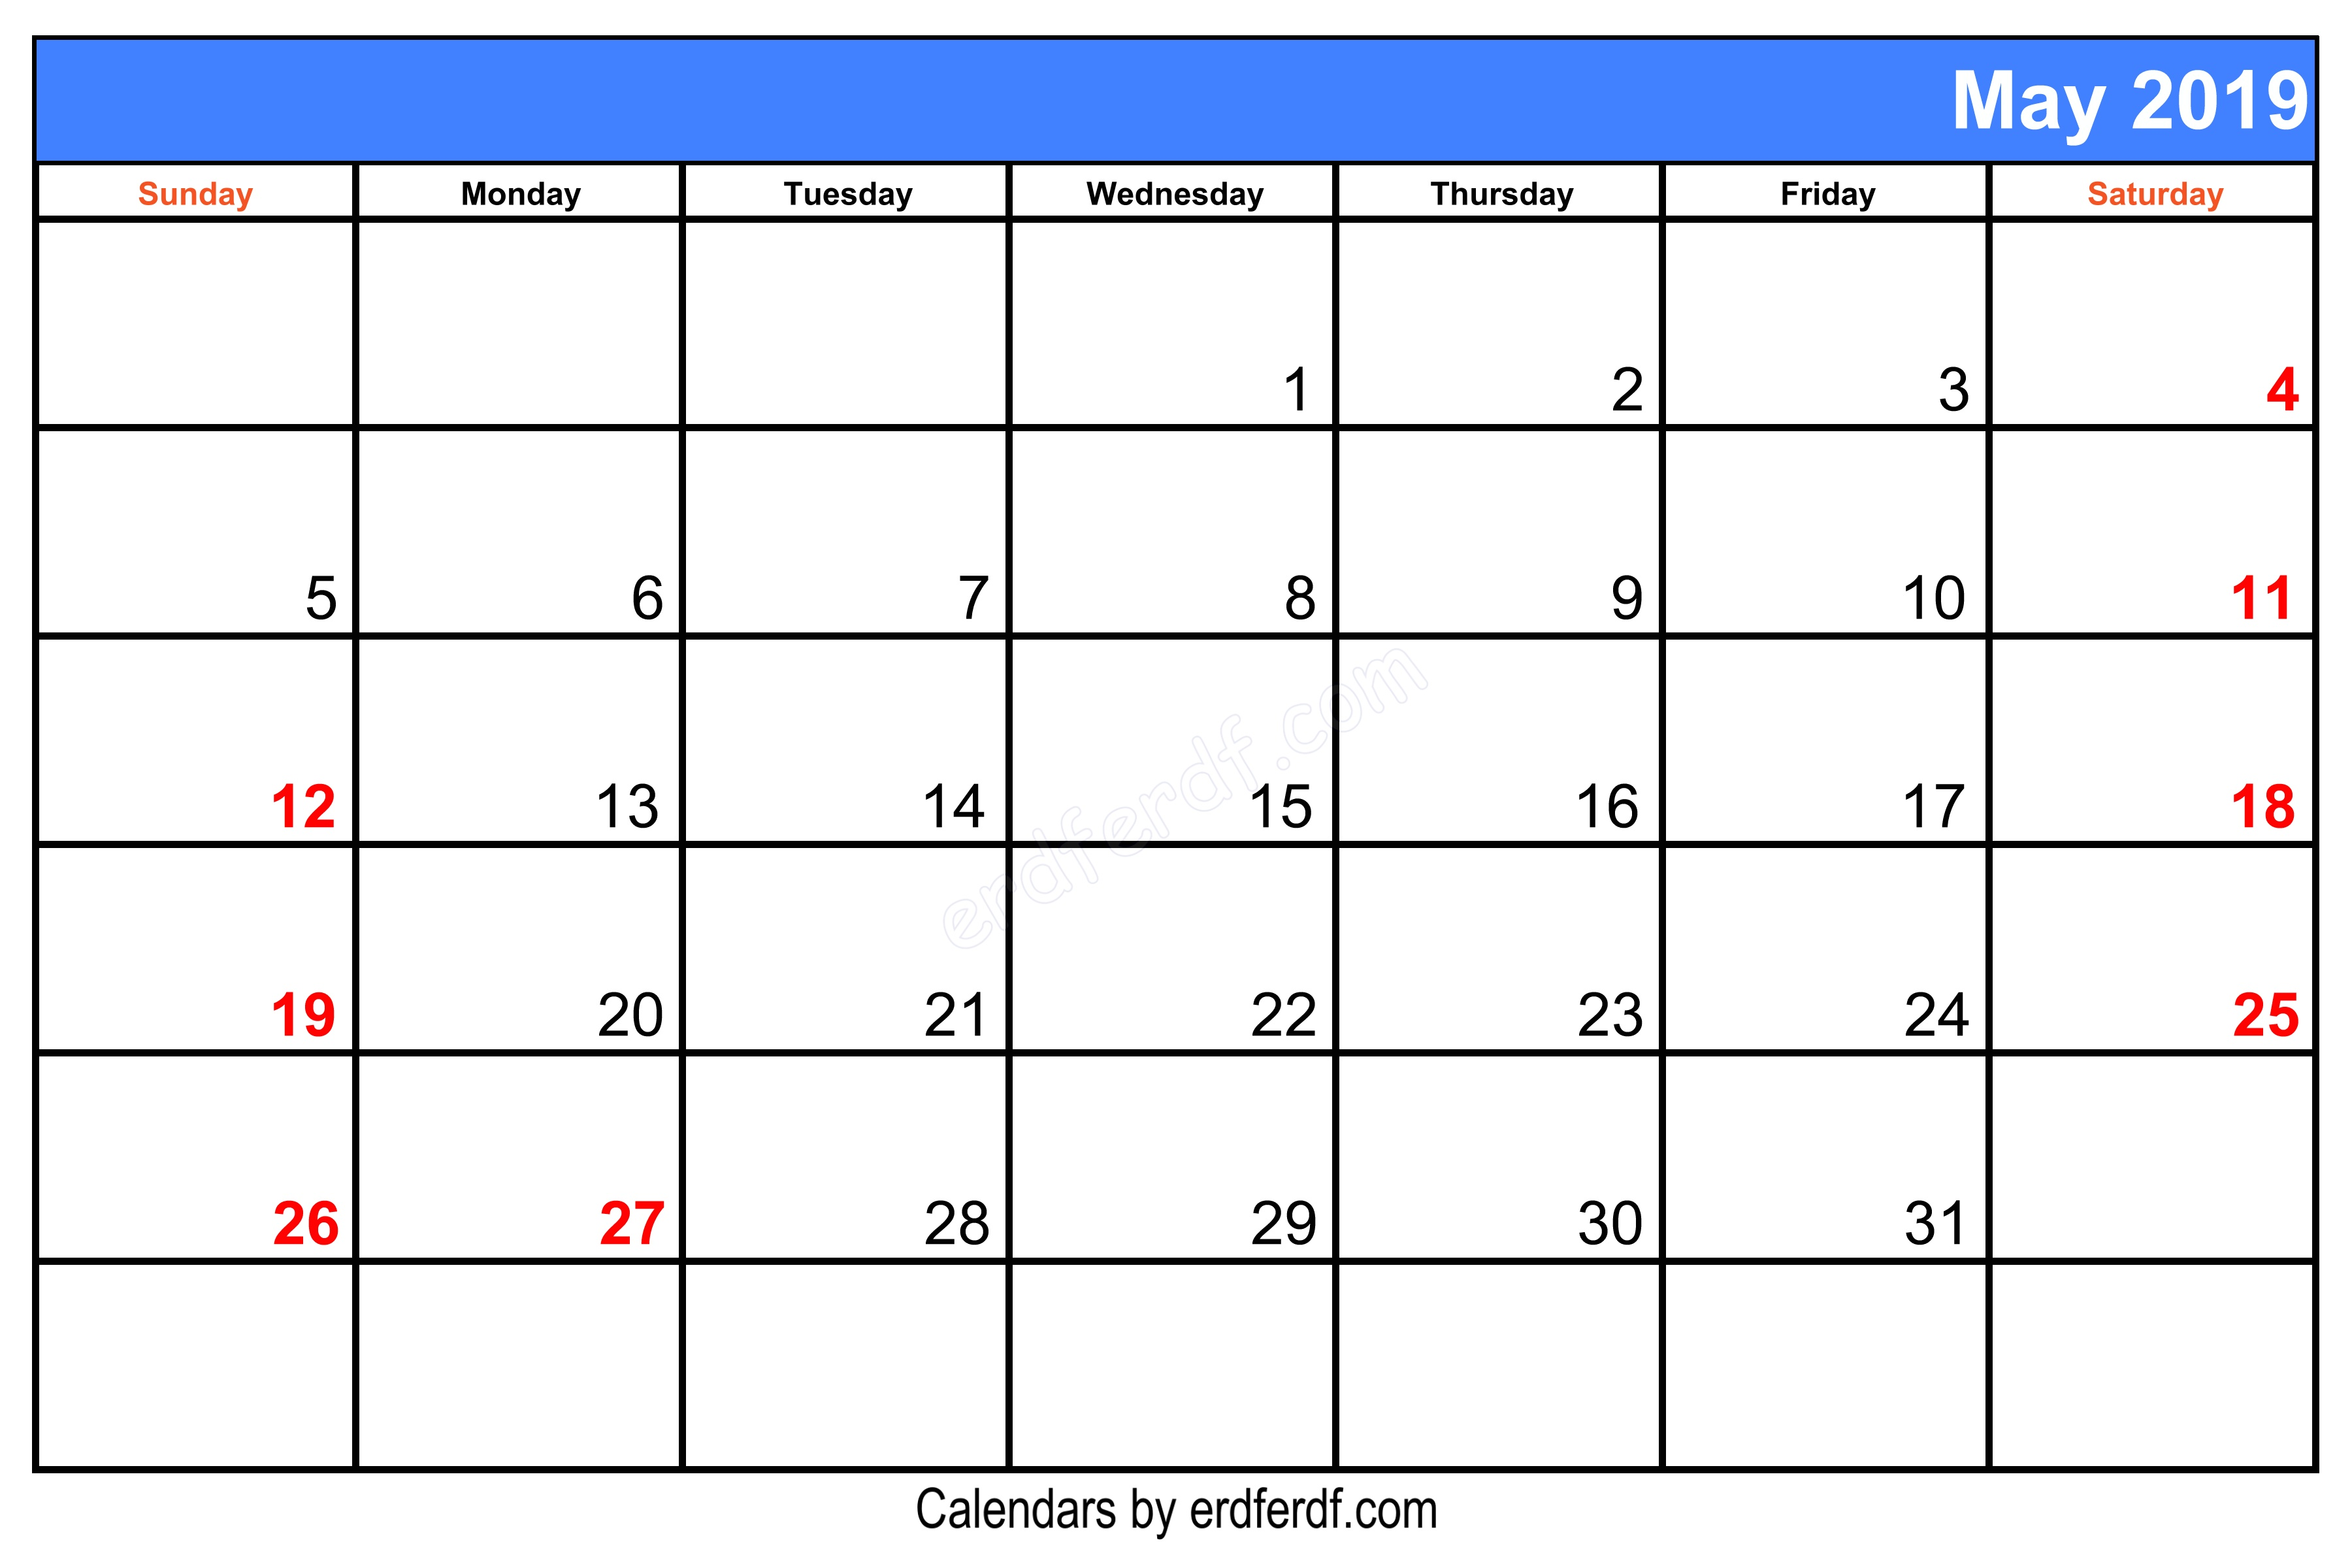 Blank May 2019 Calendar Printable Right Header